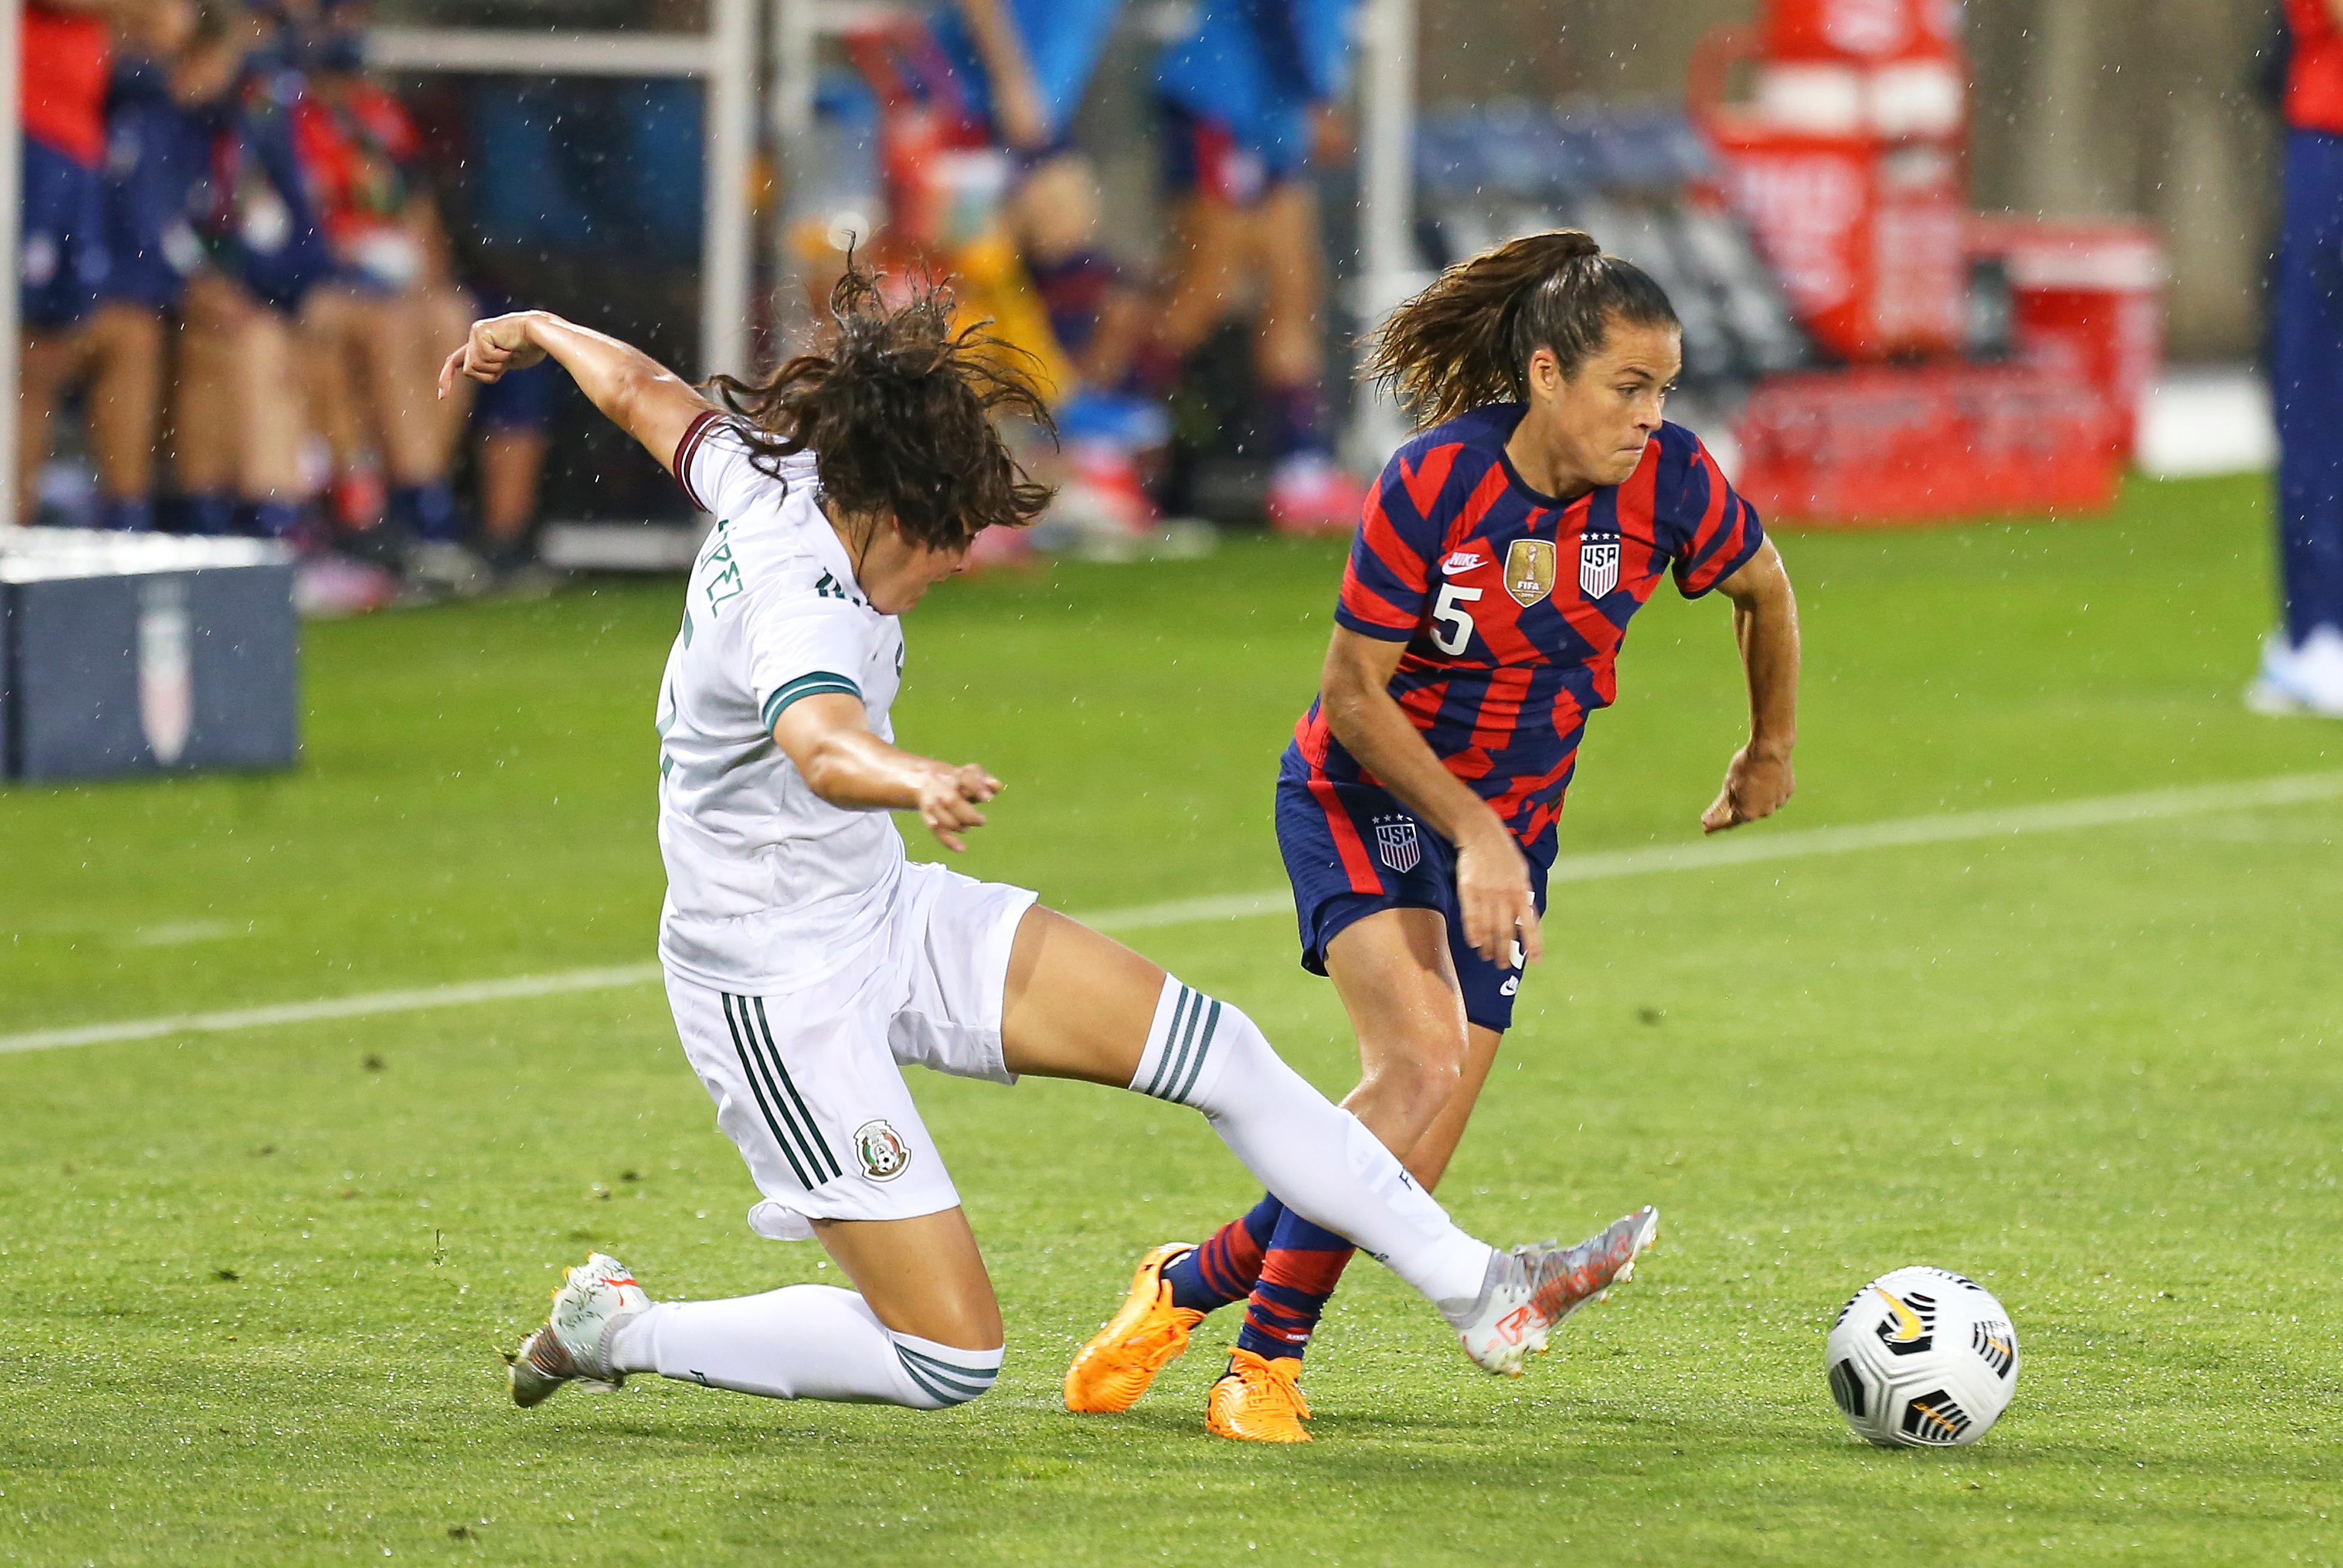 SOCCER: JUL 01 Women's - USA v Mexico